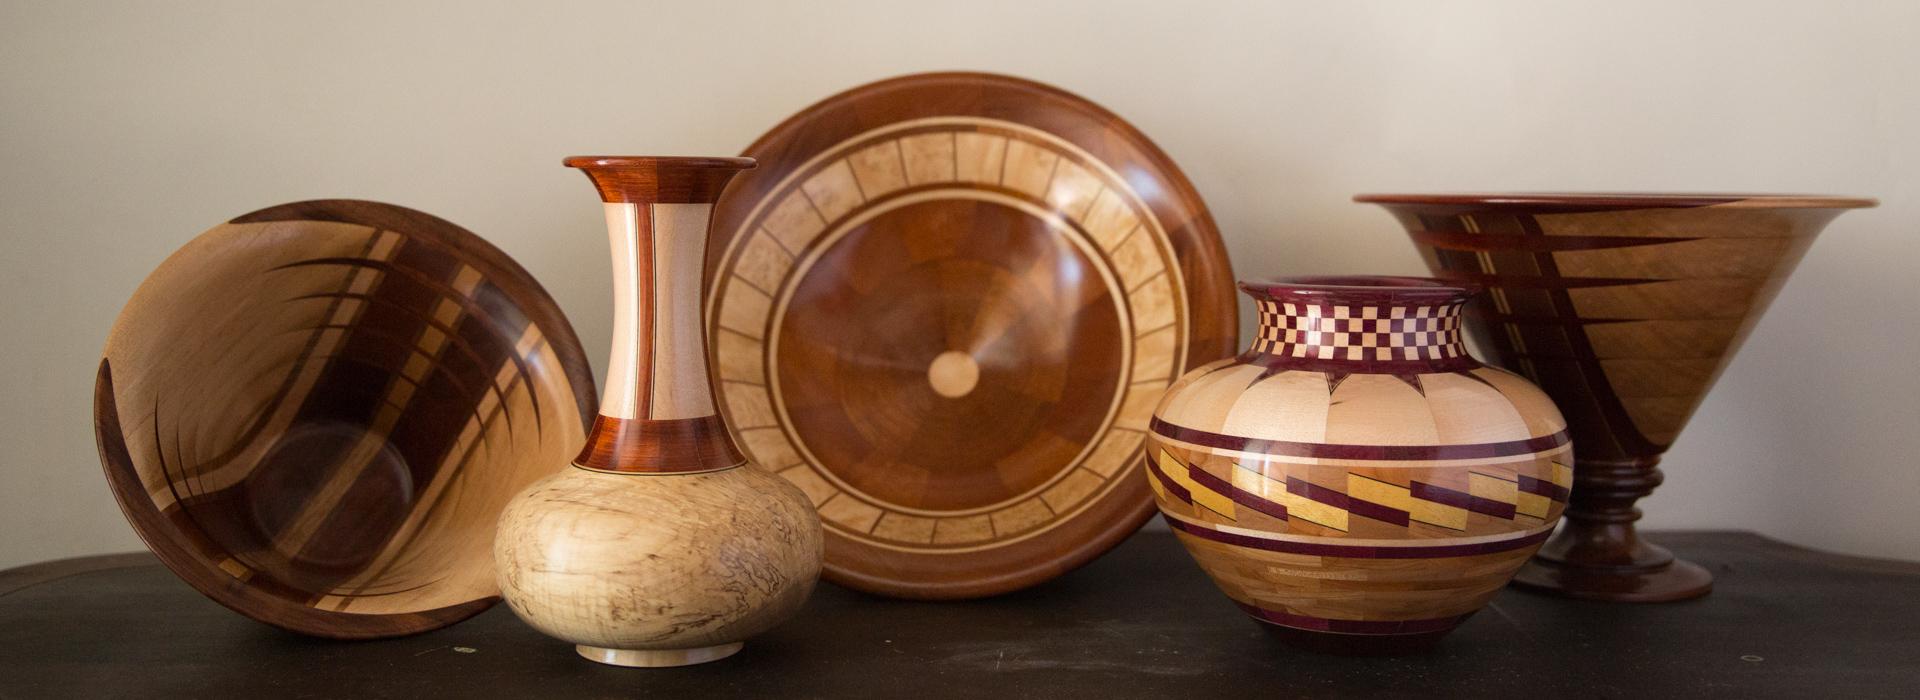 Segmented wood turned bowls